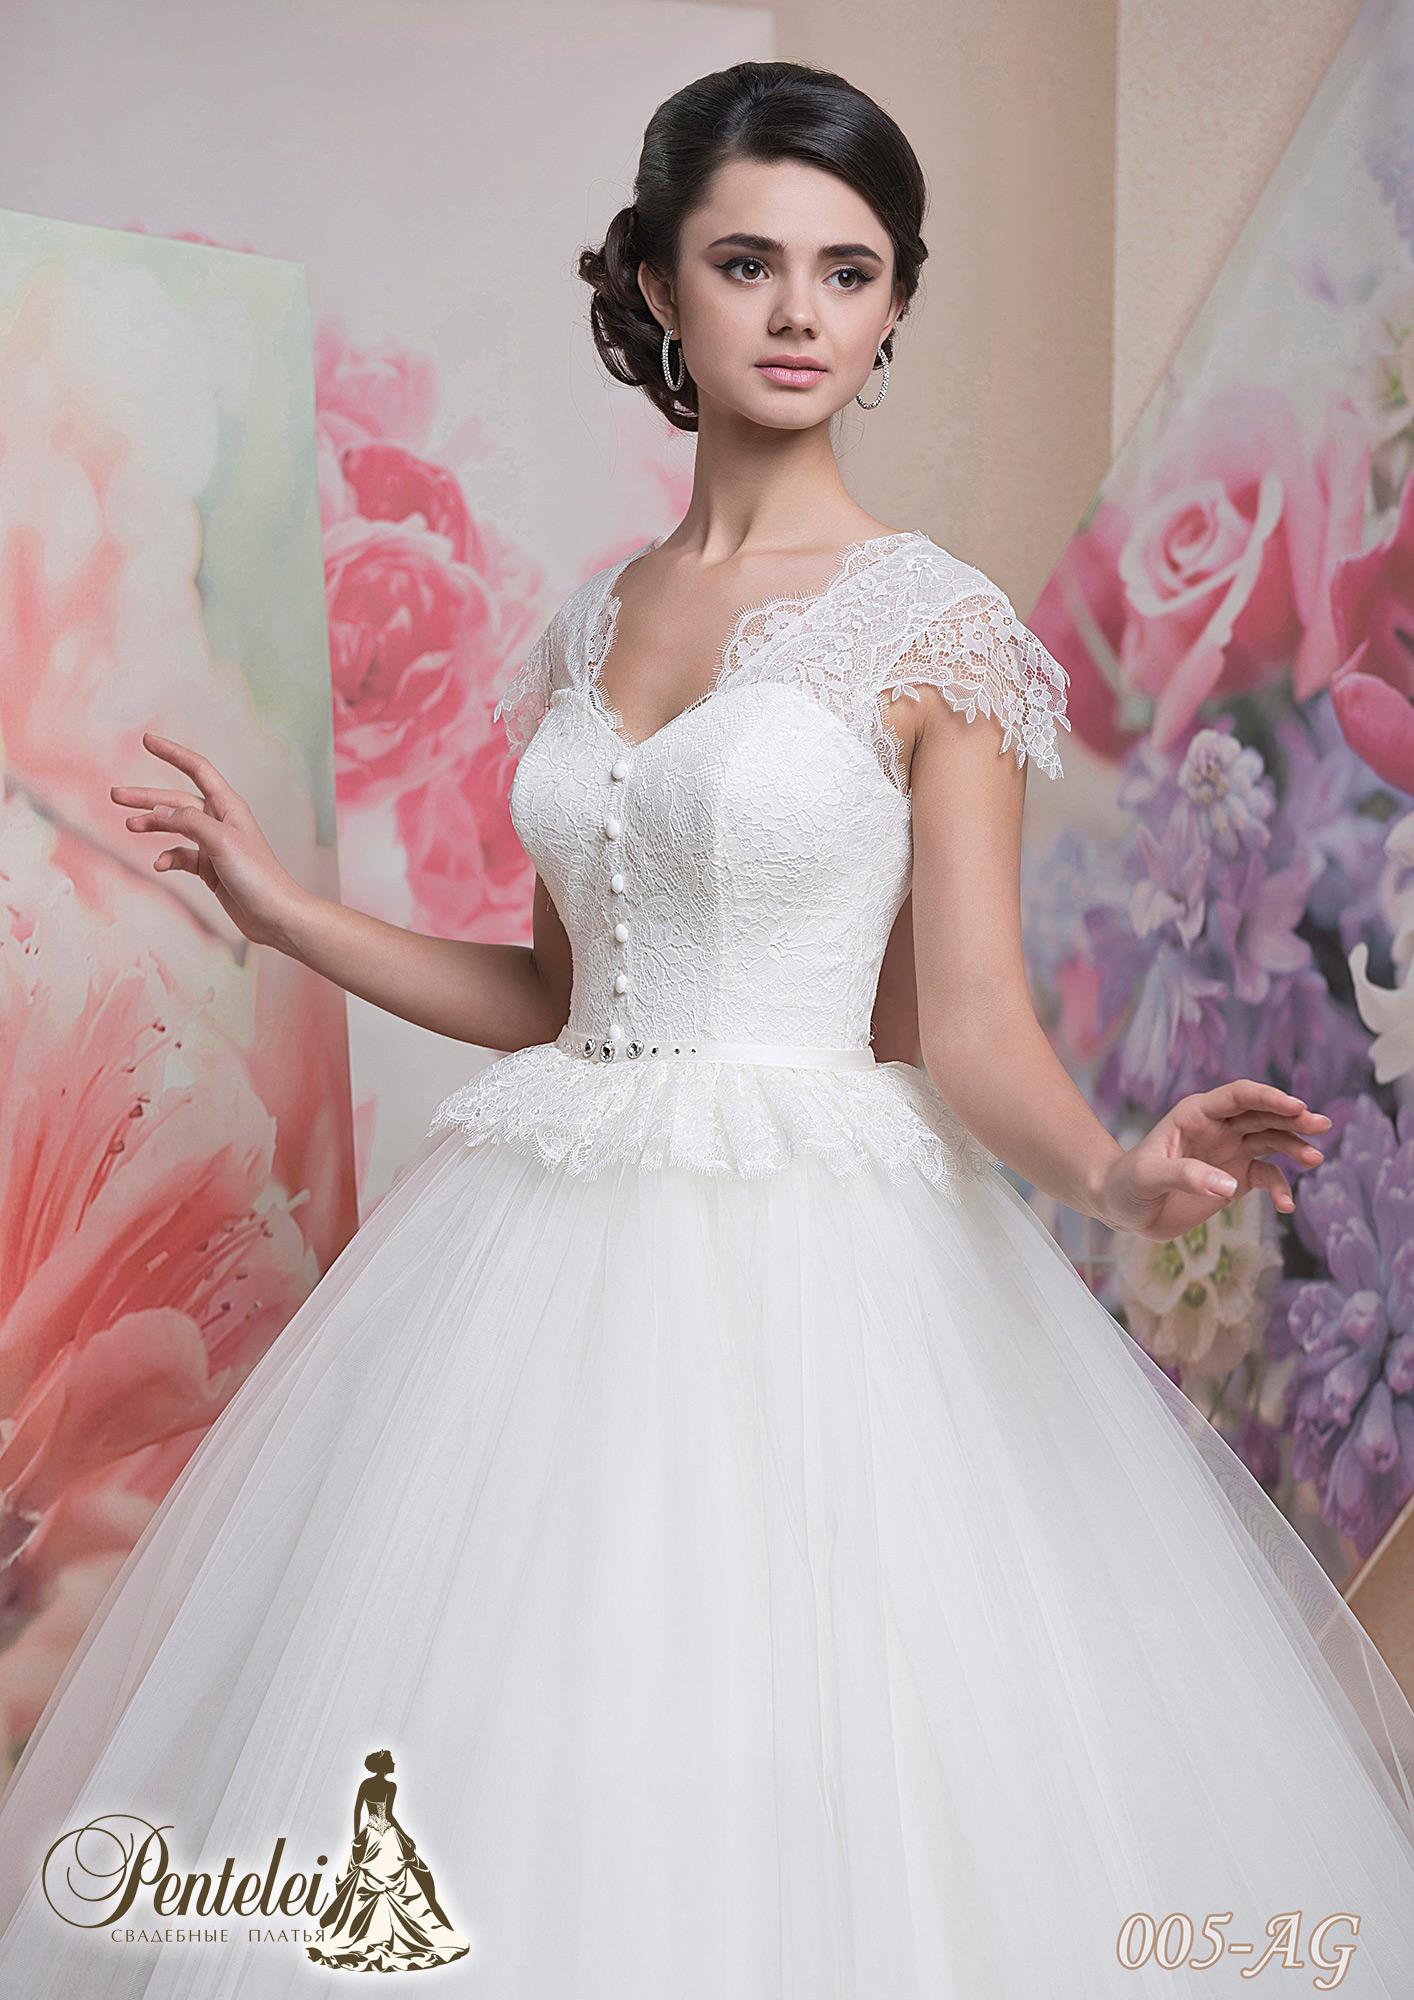 005-AG | Cumpăra rochii de mireasă en-gros de Pentelei